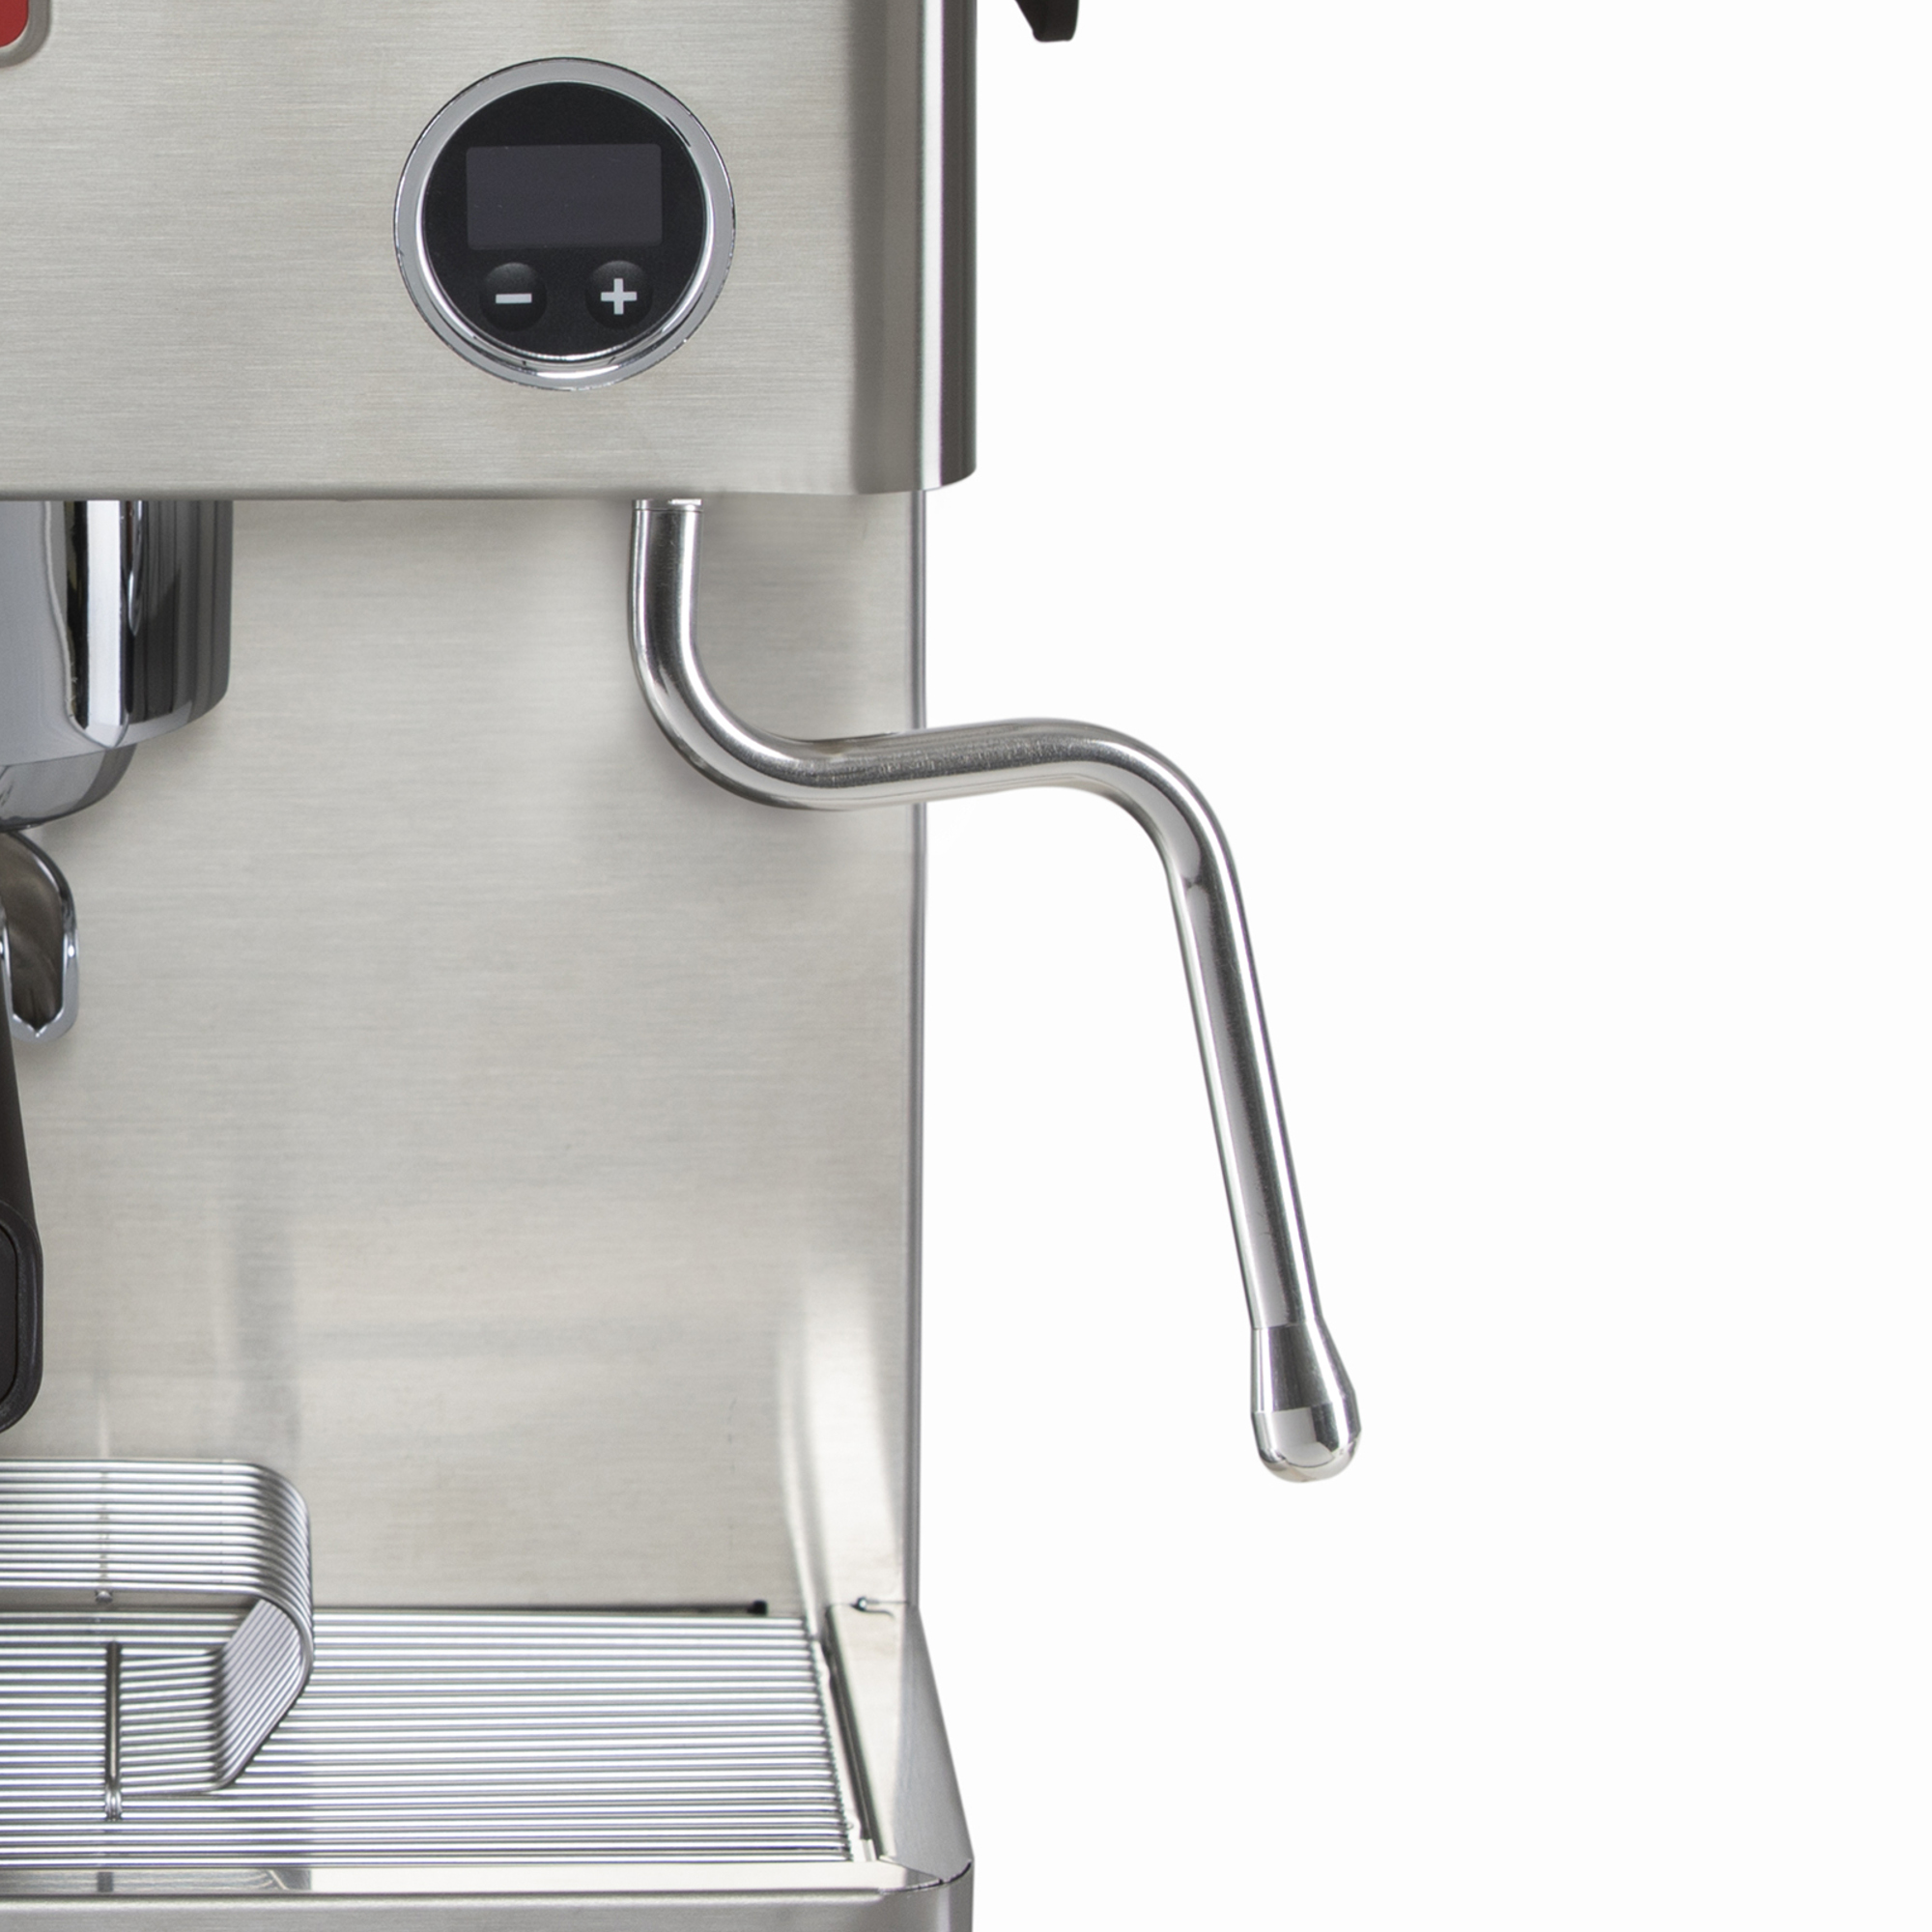 lelit-elizabeth-pl92t-cool-touch-steam-arm.jpg